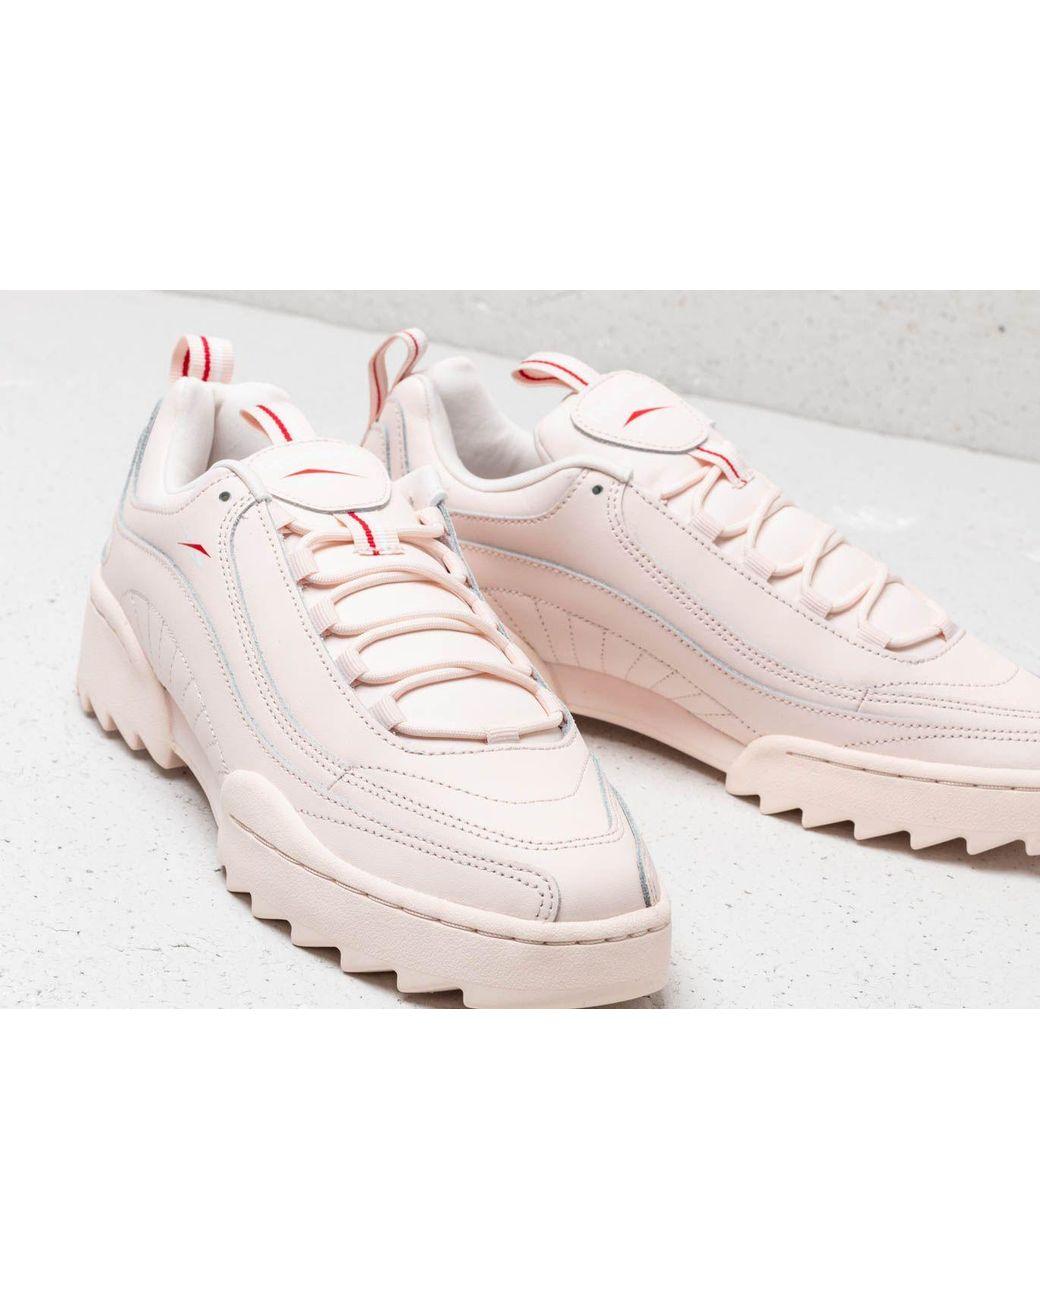 f53748c679f Lyst - Reebok Reebok Rivyx Ripple Pale Pink  White  Red in Pink